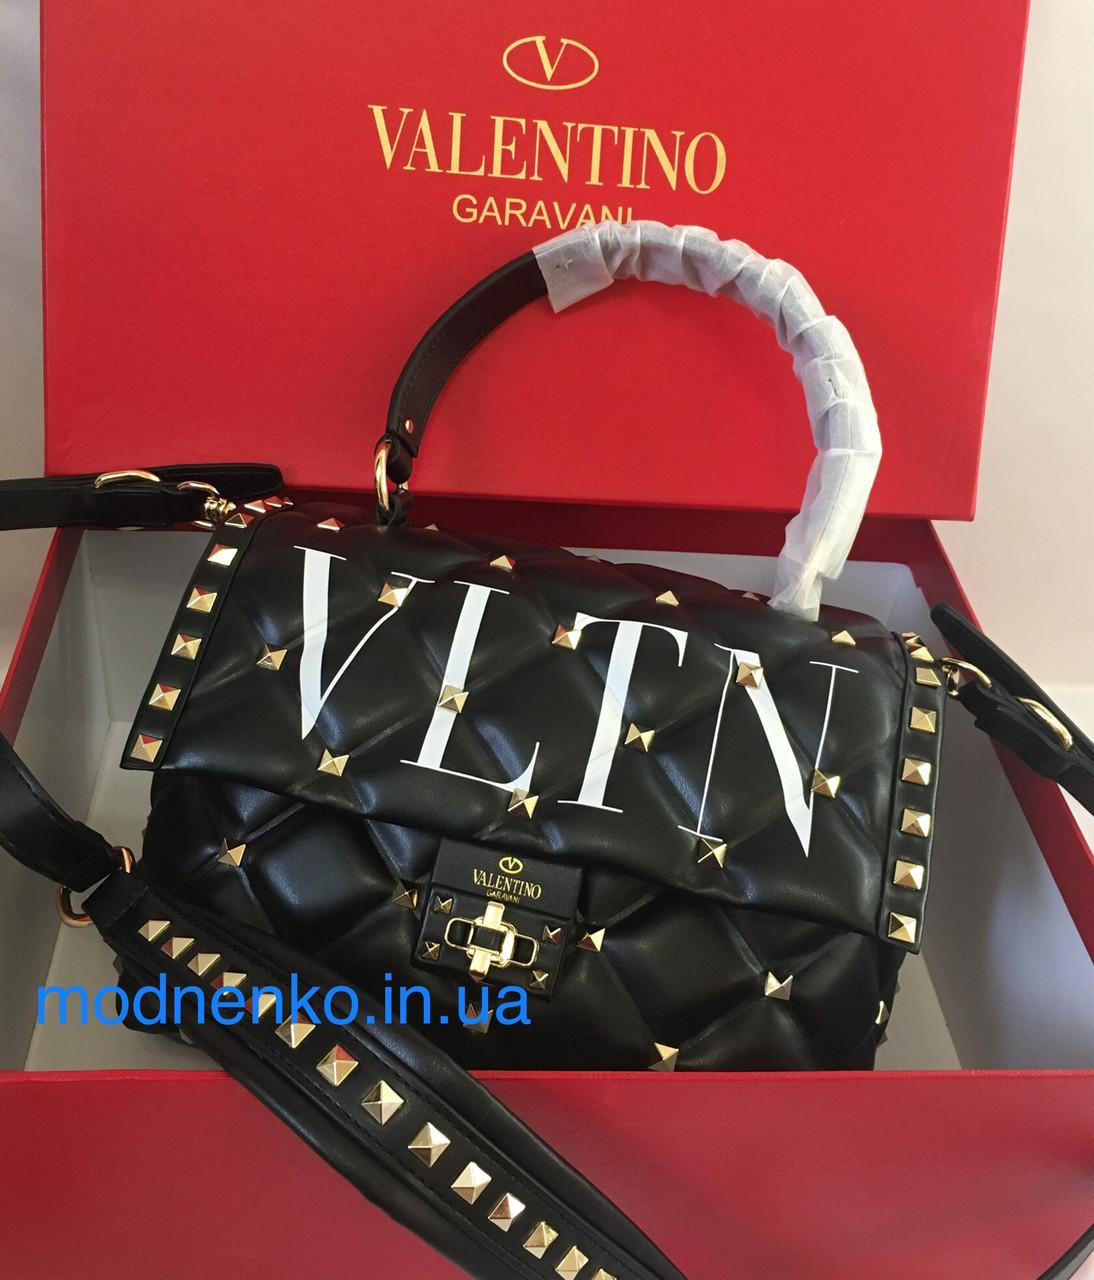 c6f17ddb0cbd Женская сумка Valentino GARAVANI VLTN: продажа, цена в Харькове ...